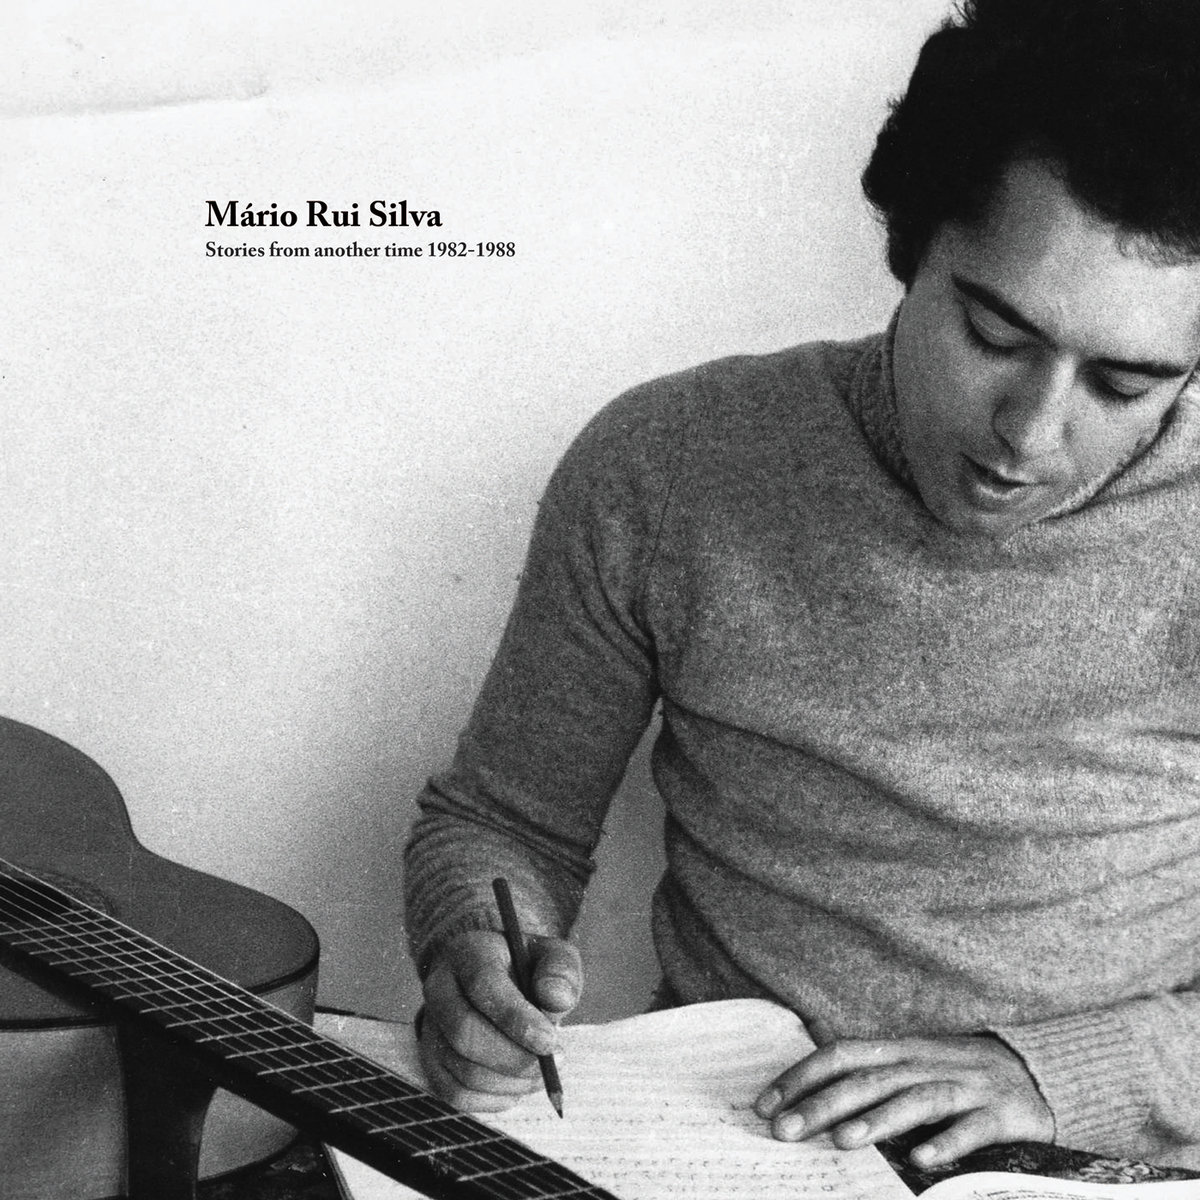 Mario Rui Silva